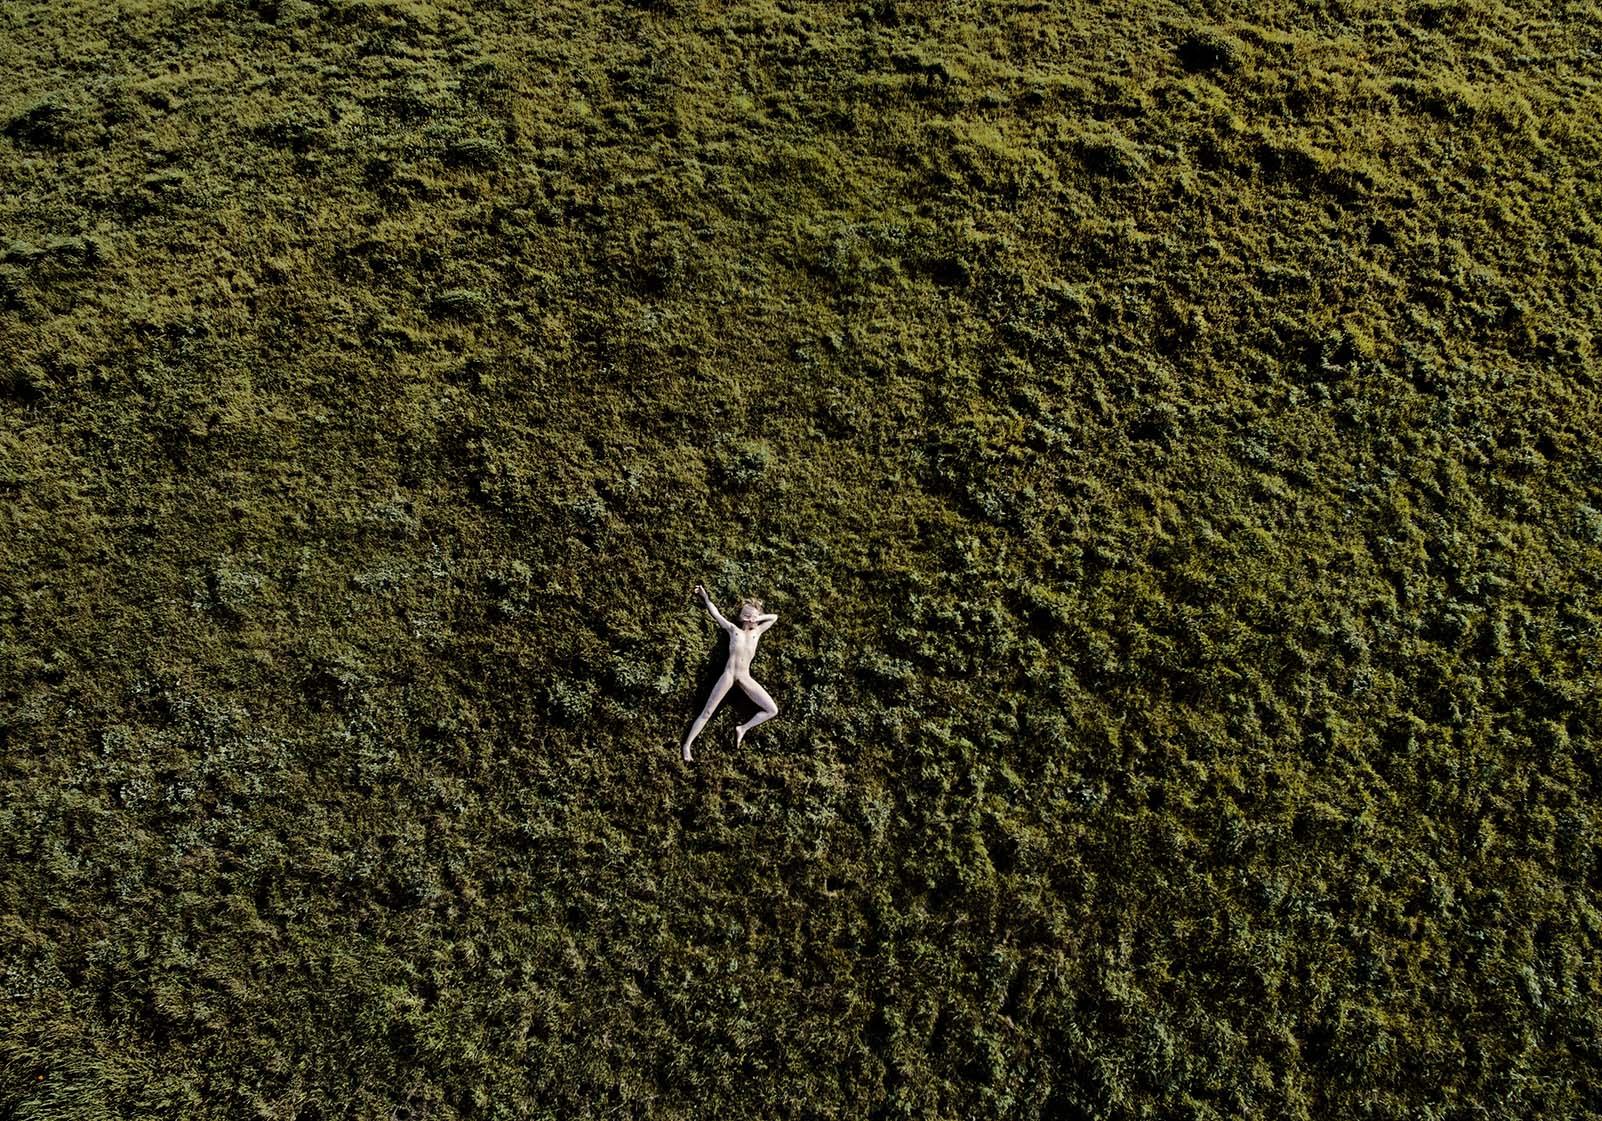 Drone Muff.jpg